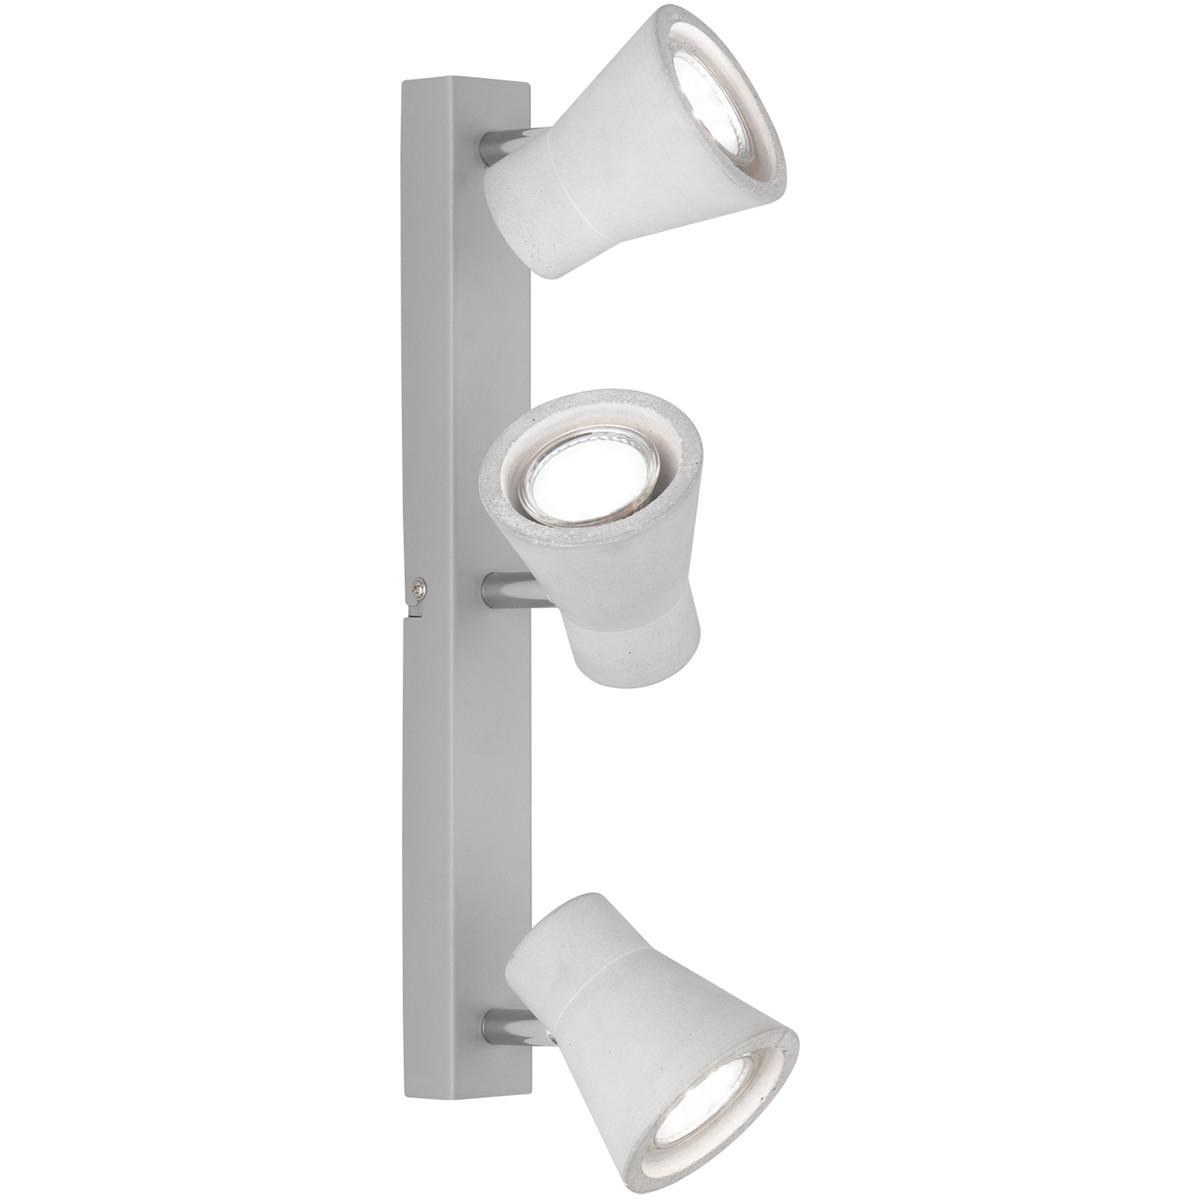 LED Plafondspot - Trion Antyna - GU10 Fitting - 9W - Warm Wit 3000K - 3-lichts - Rond - Beton Look -